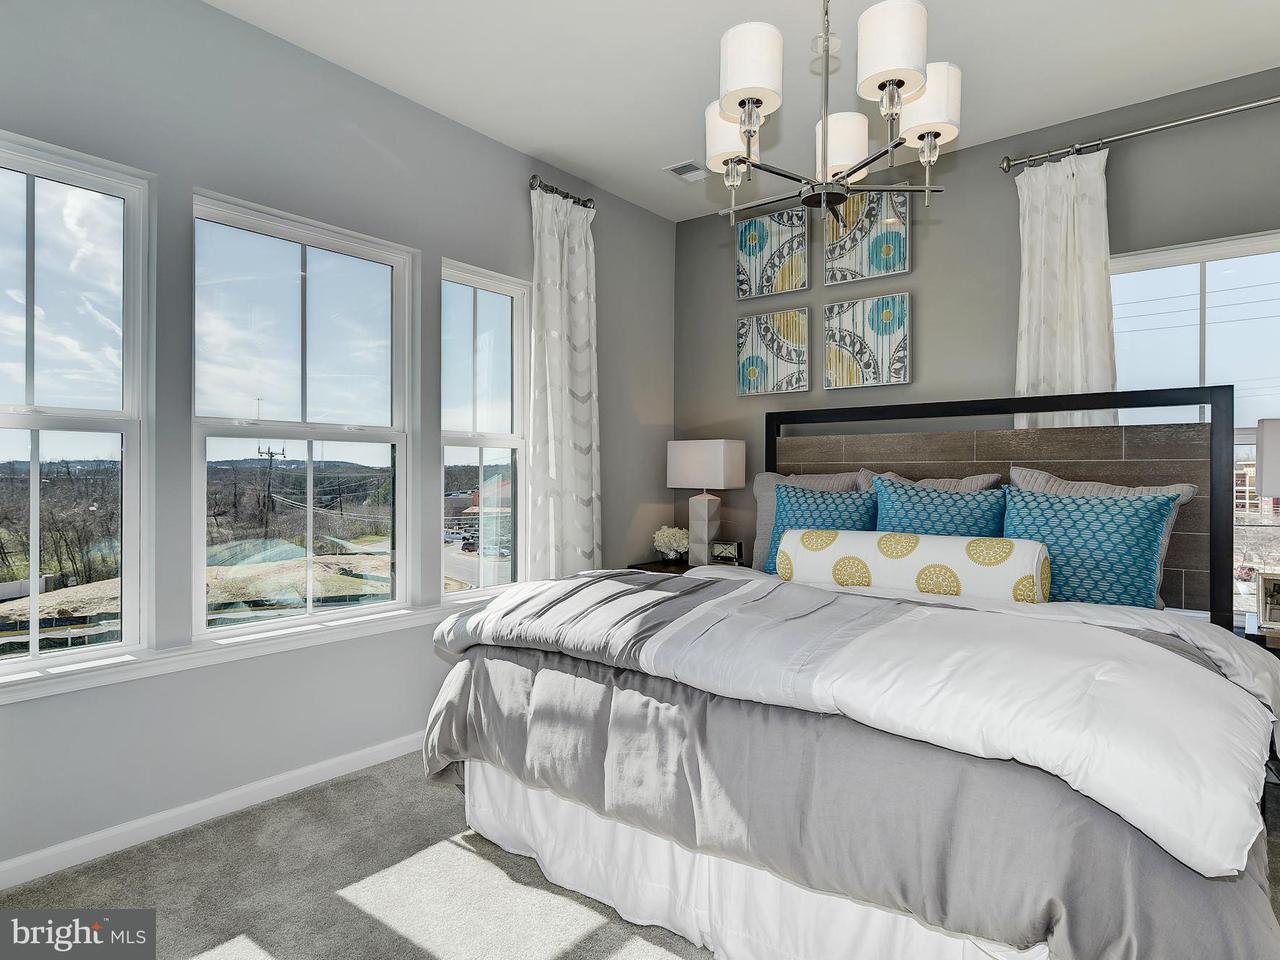 Additional photo for property listing at 3635 JAMISON ST NE 3635 JAMISON ST NE Washington, Округ Колумбия 20018 Соединенные Штаты